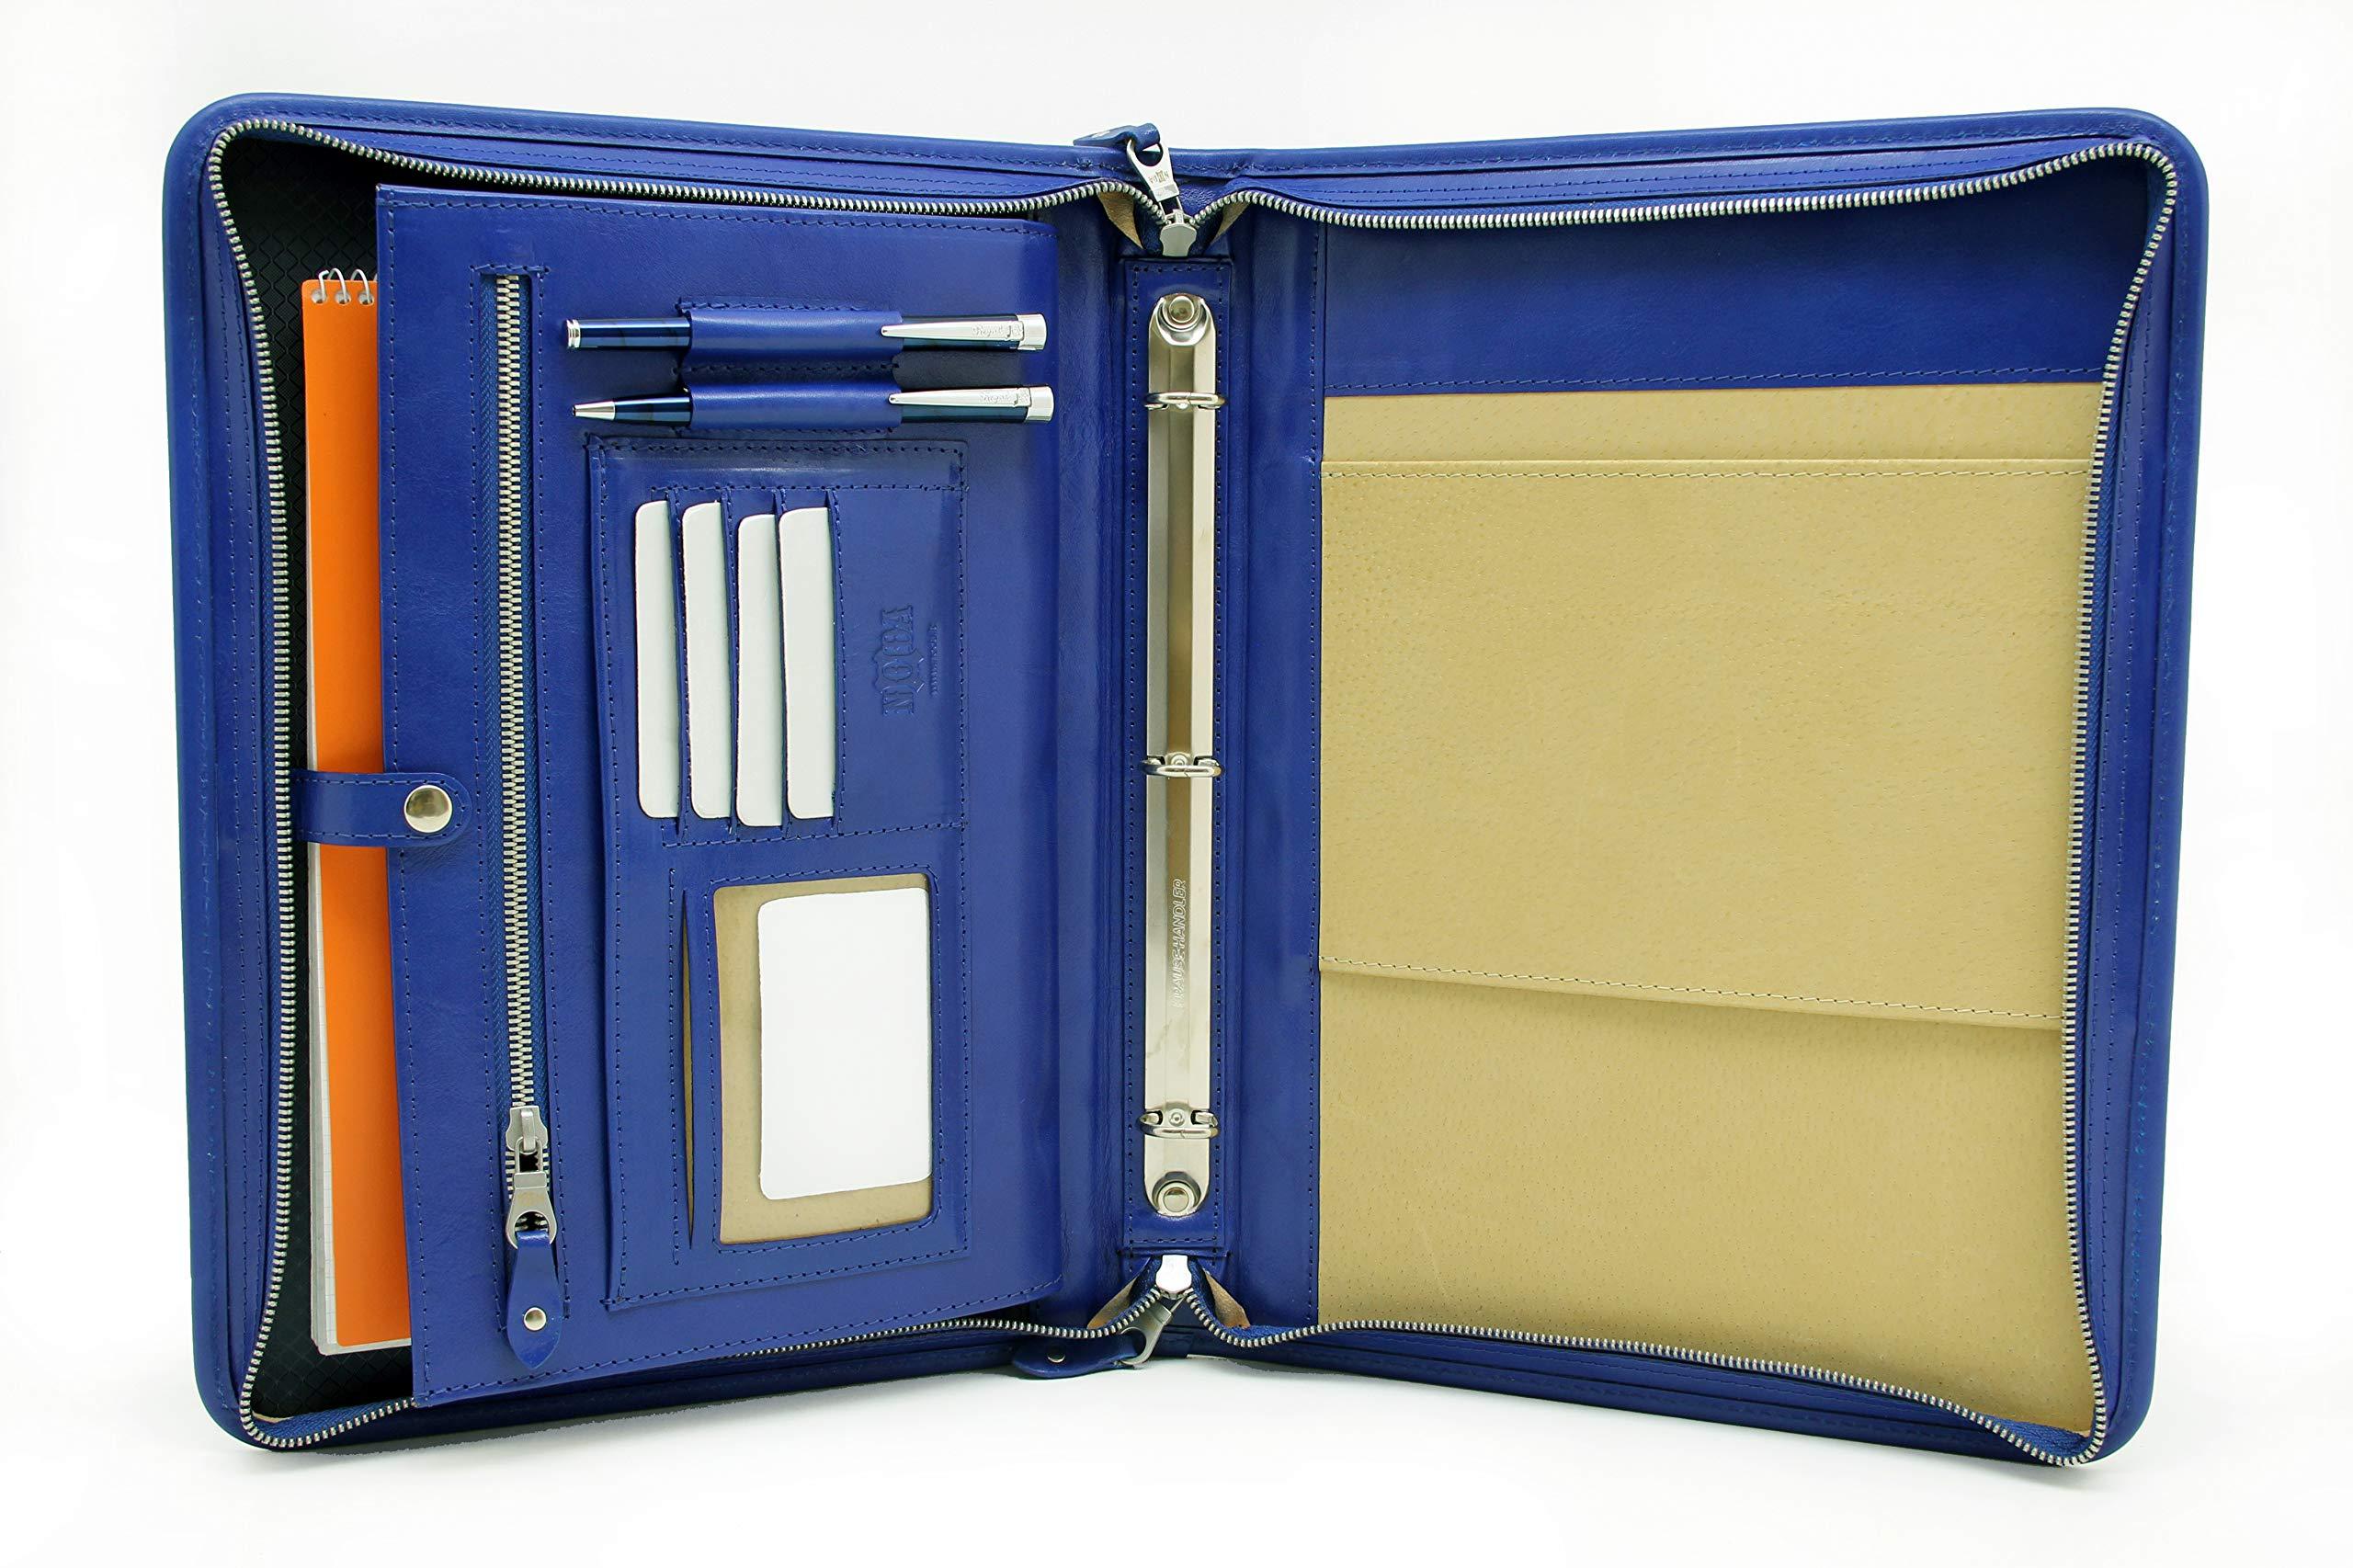 Noda Leather Portfolio,3 Ring Binder, Leather Document Organizer. Professional Folder Letter Size, Notepad Holder (Blue)